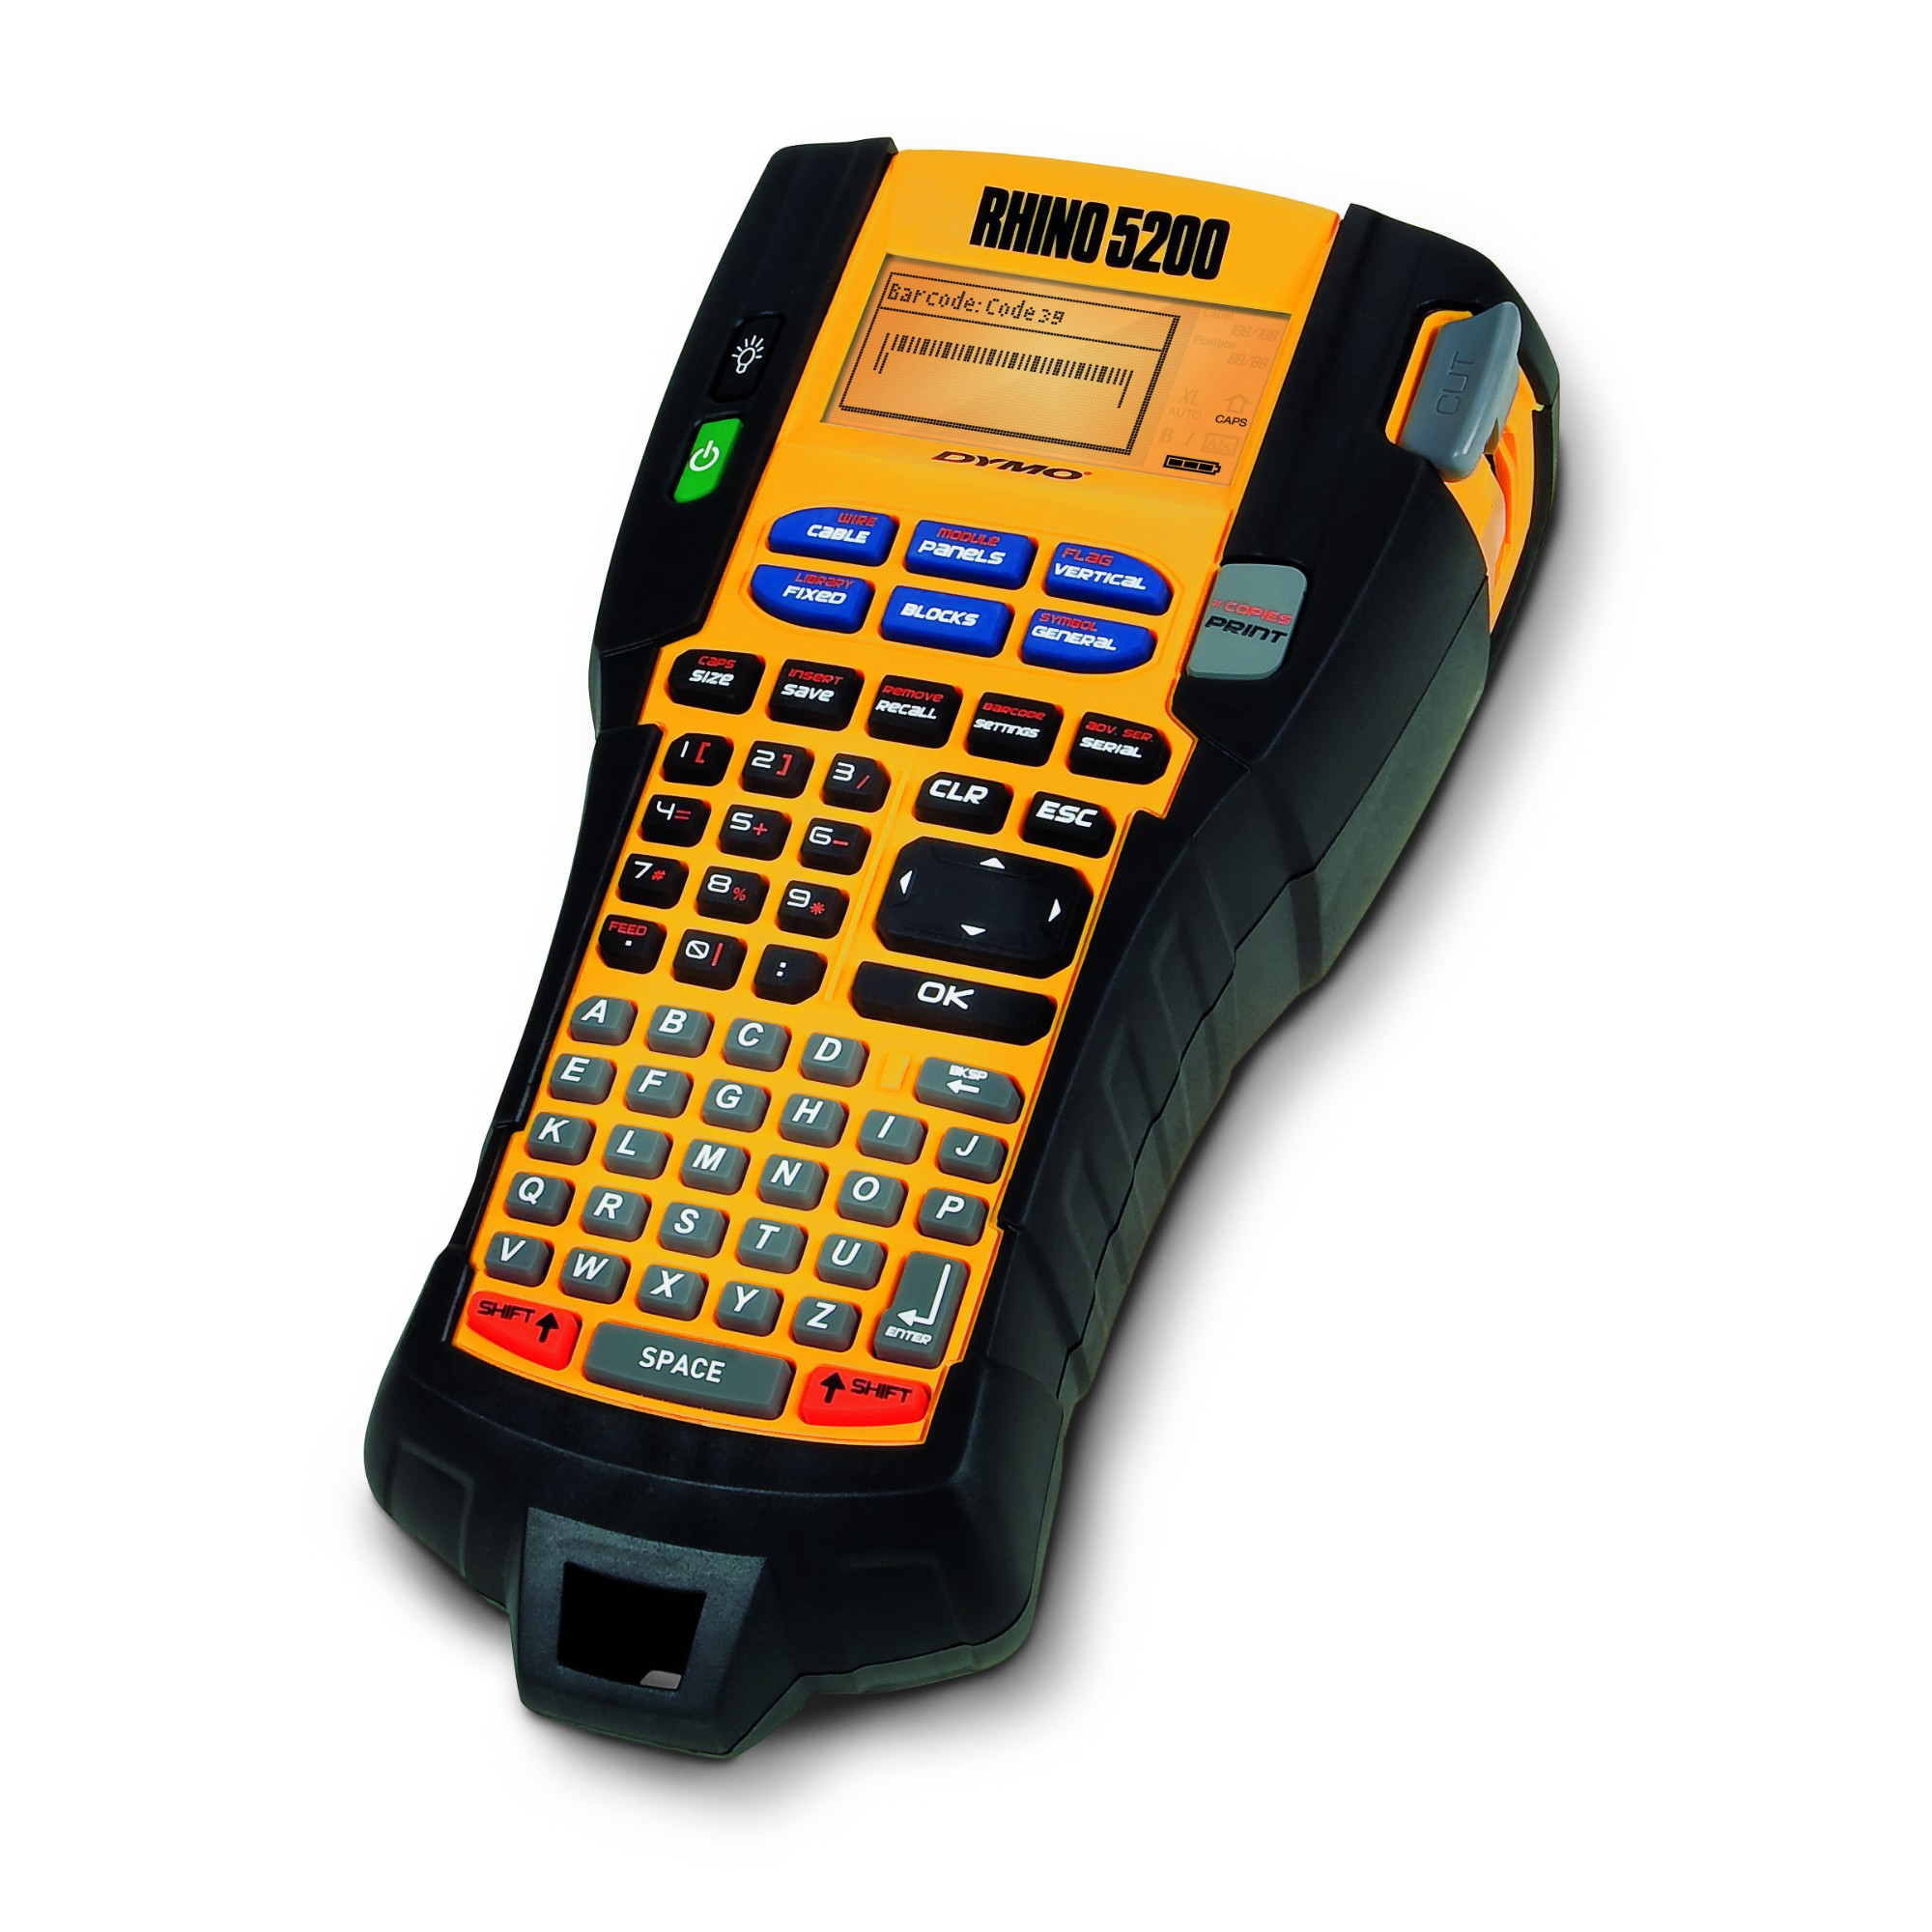 DYMO RHINO 5200 Kit Thermal transfer 180 x 180DPI label printer